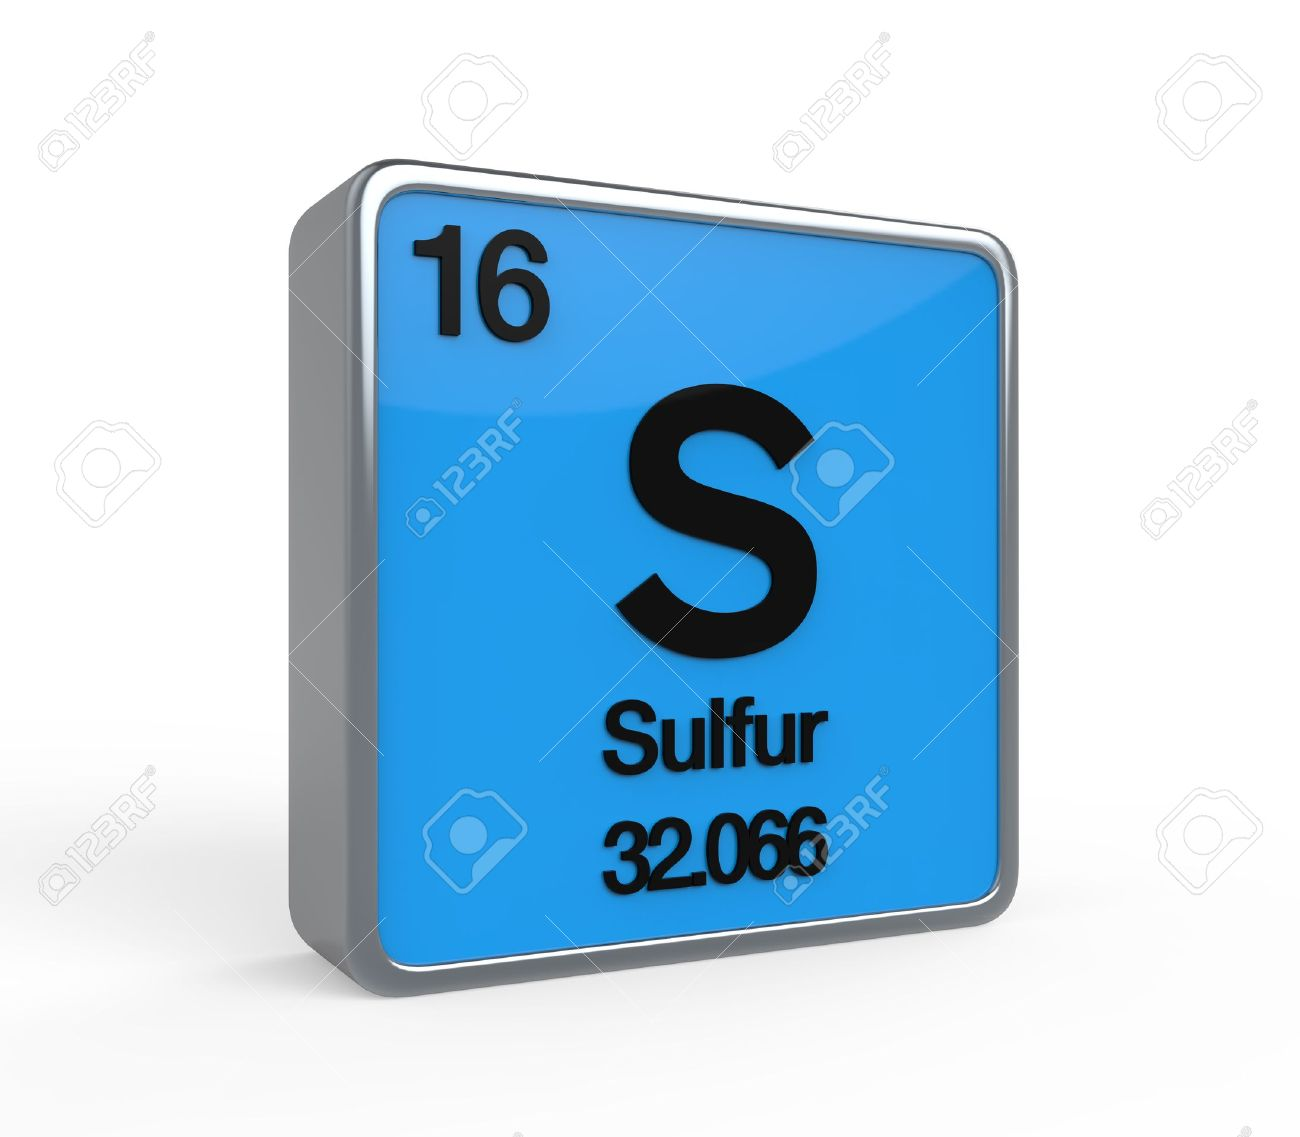 Sulfur element periodic table stock photo picture and royalty sulfur element periodic table stock photo 20533988 gamestrikefo Choice Image